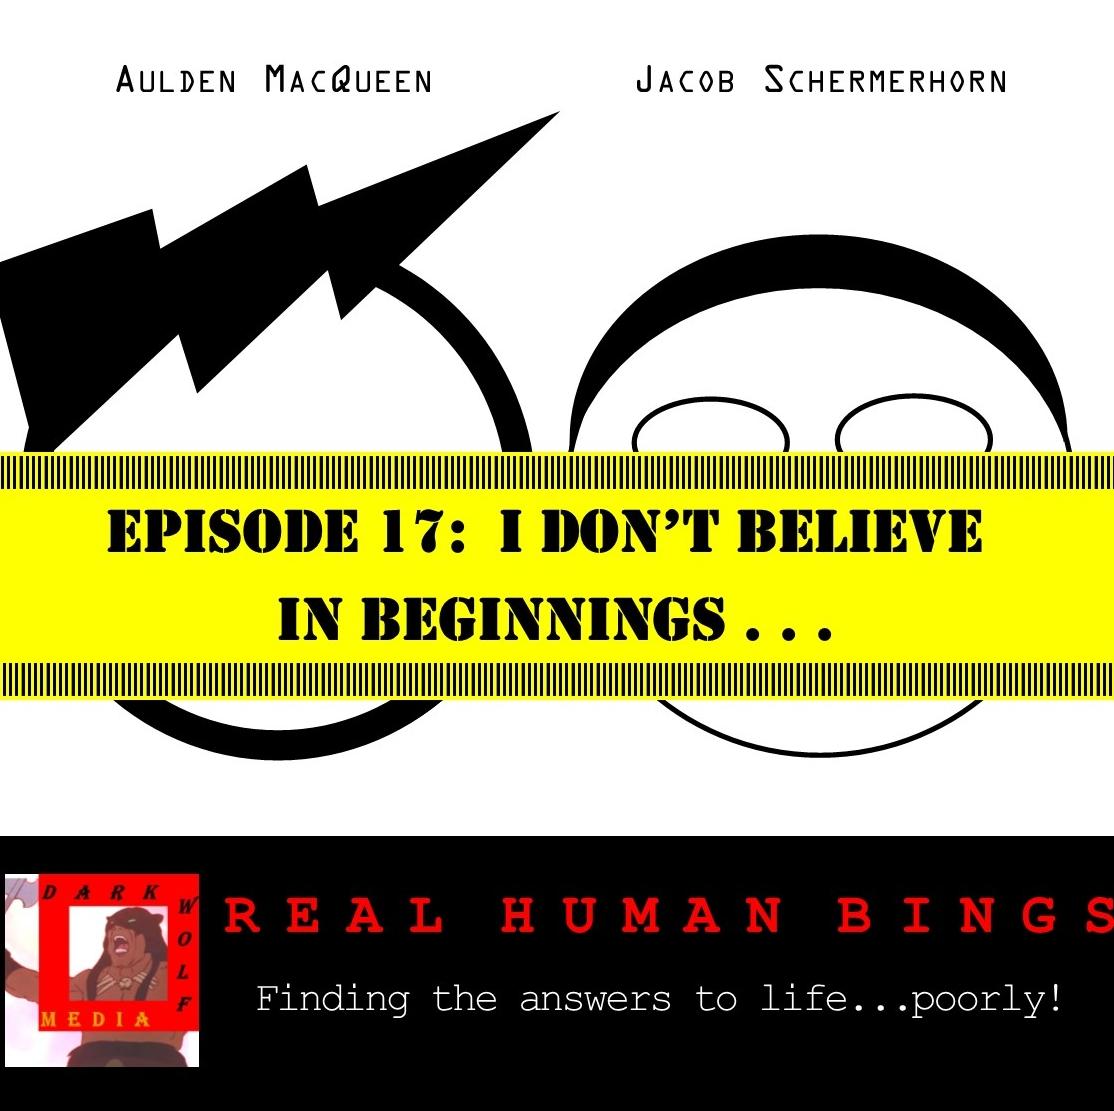 Episode 17 Cover.jpg